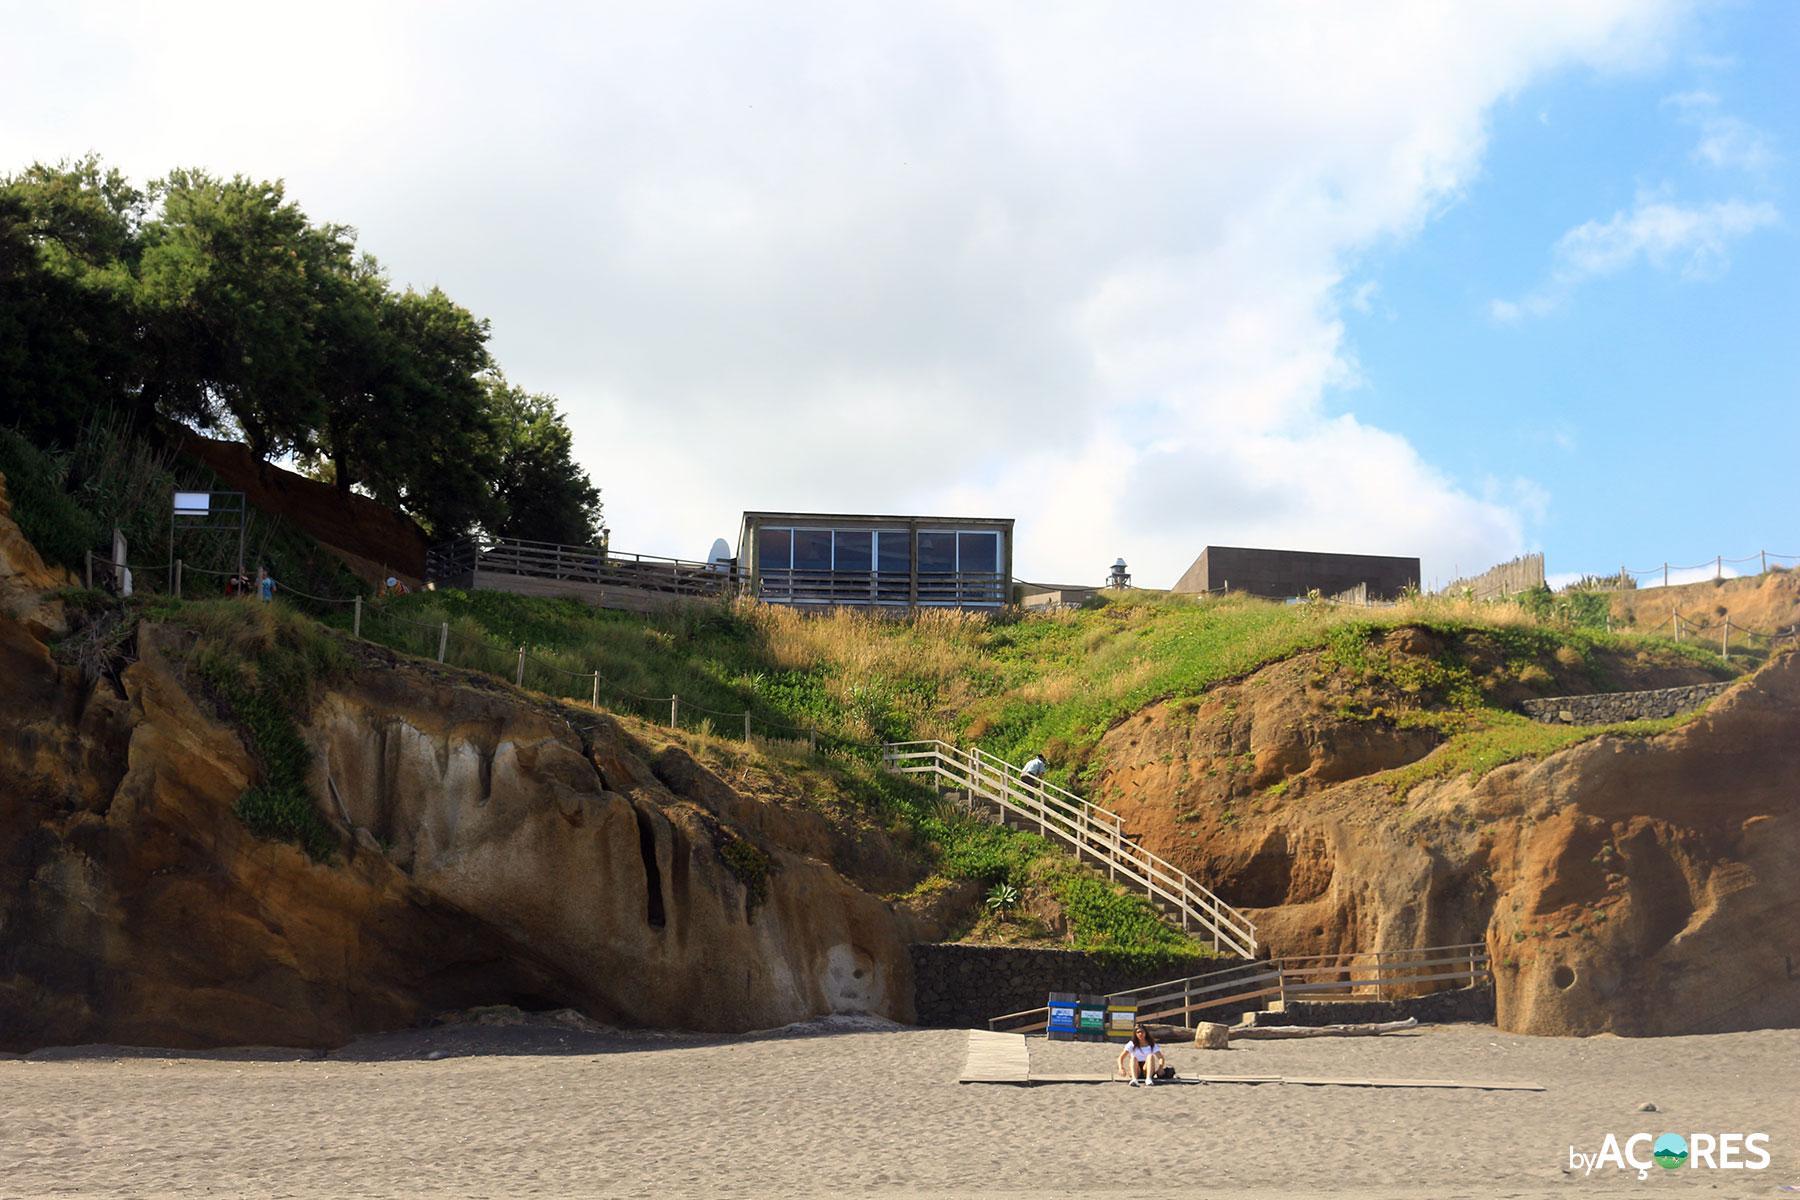 Beach Club Areal de Santa Bárbara, Ribeira Grande